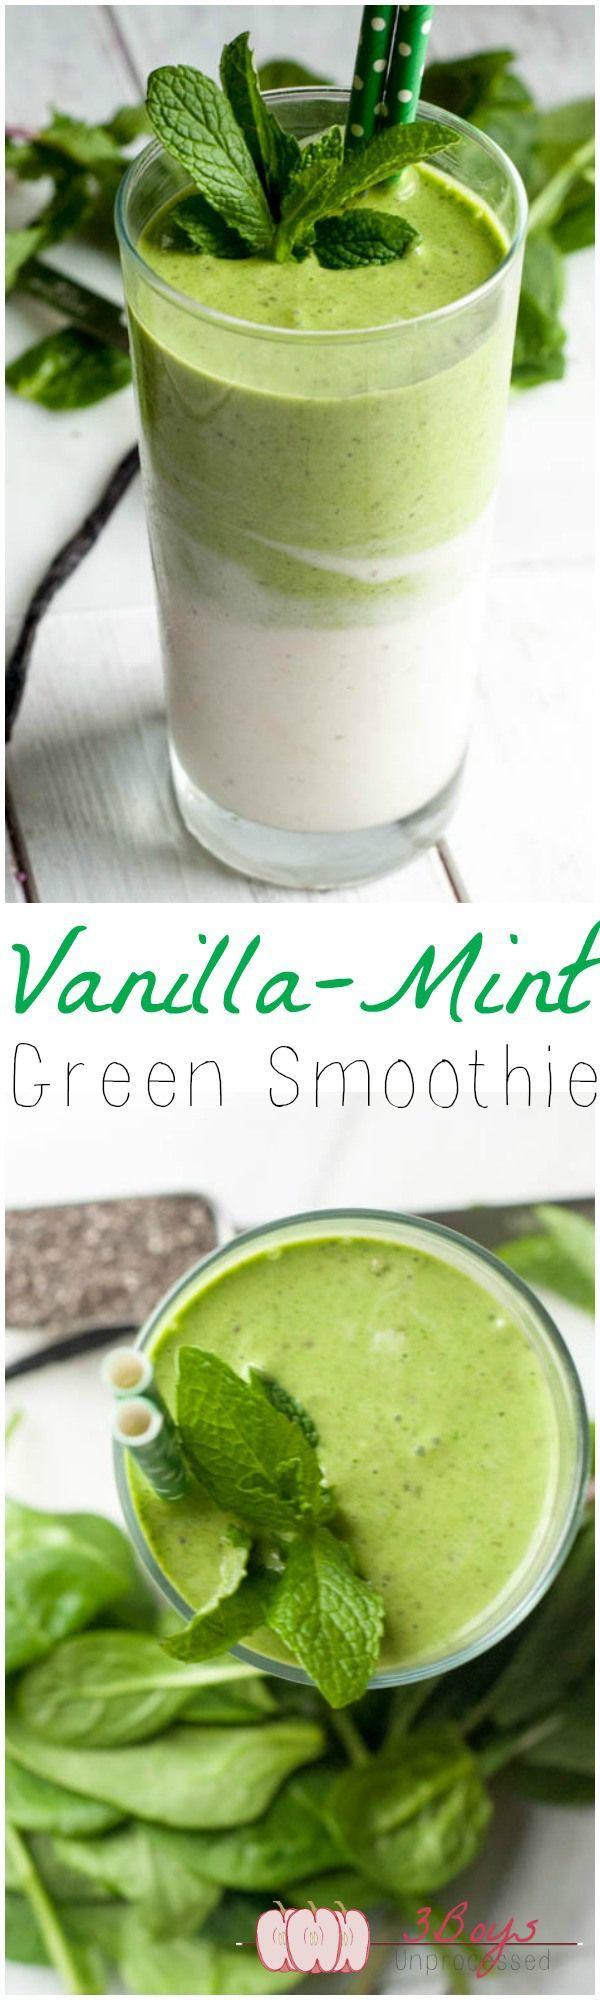 VANILLA MINT GREEN SMOOTHIE: (green layer) spinach, mint, banana, coconut milk; (white layer) banana, coconut milk, vanilla bean, chia seeds